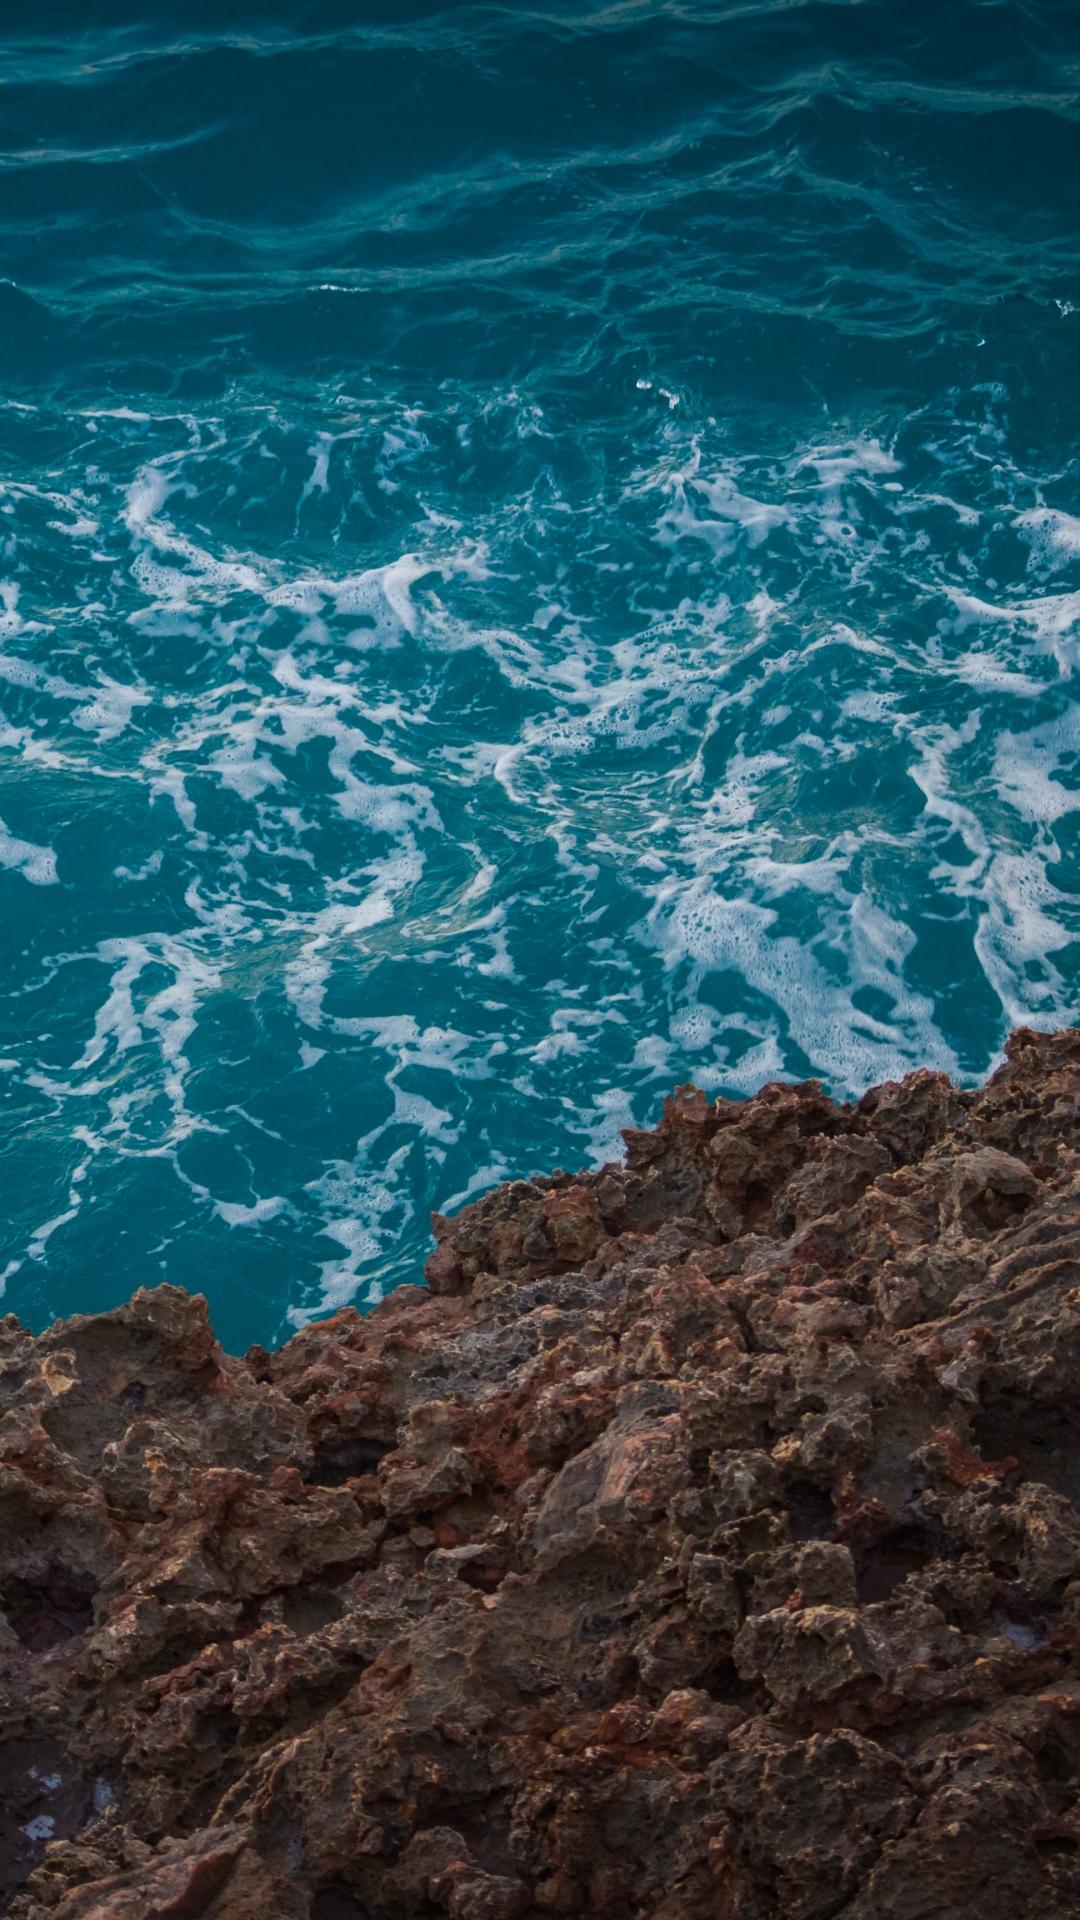 iphone wallpaper sea stones foam water Nature